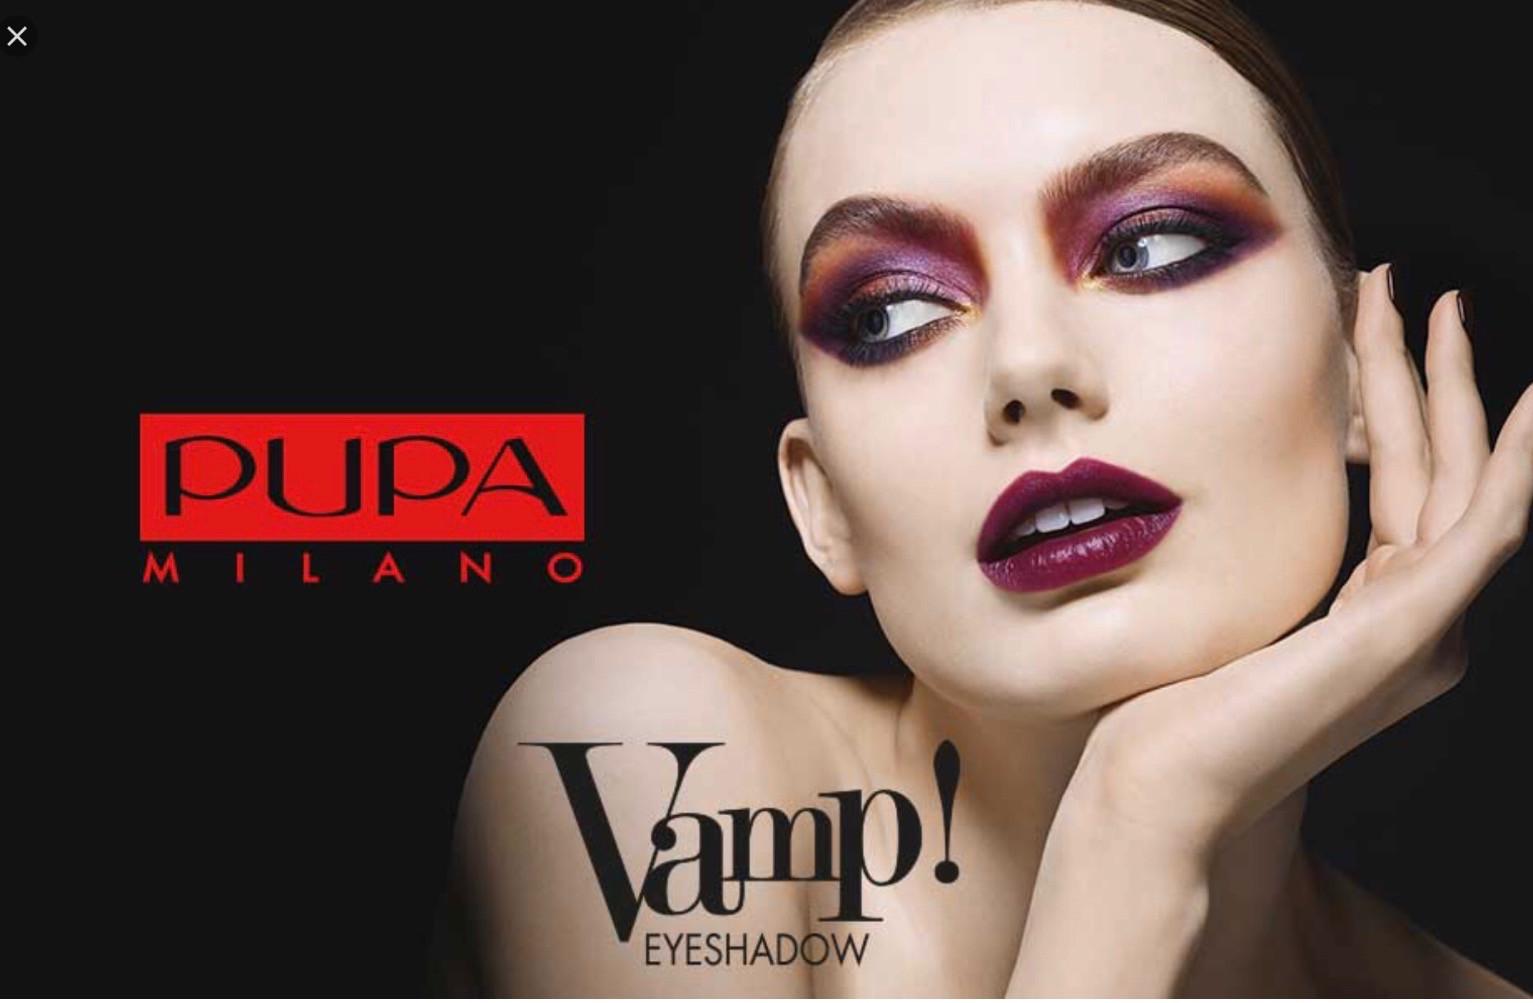 Hair & Makeup Artist Agency London